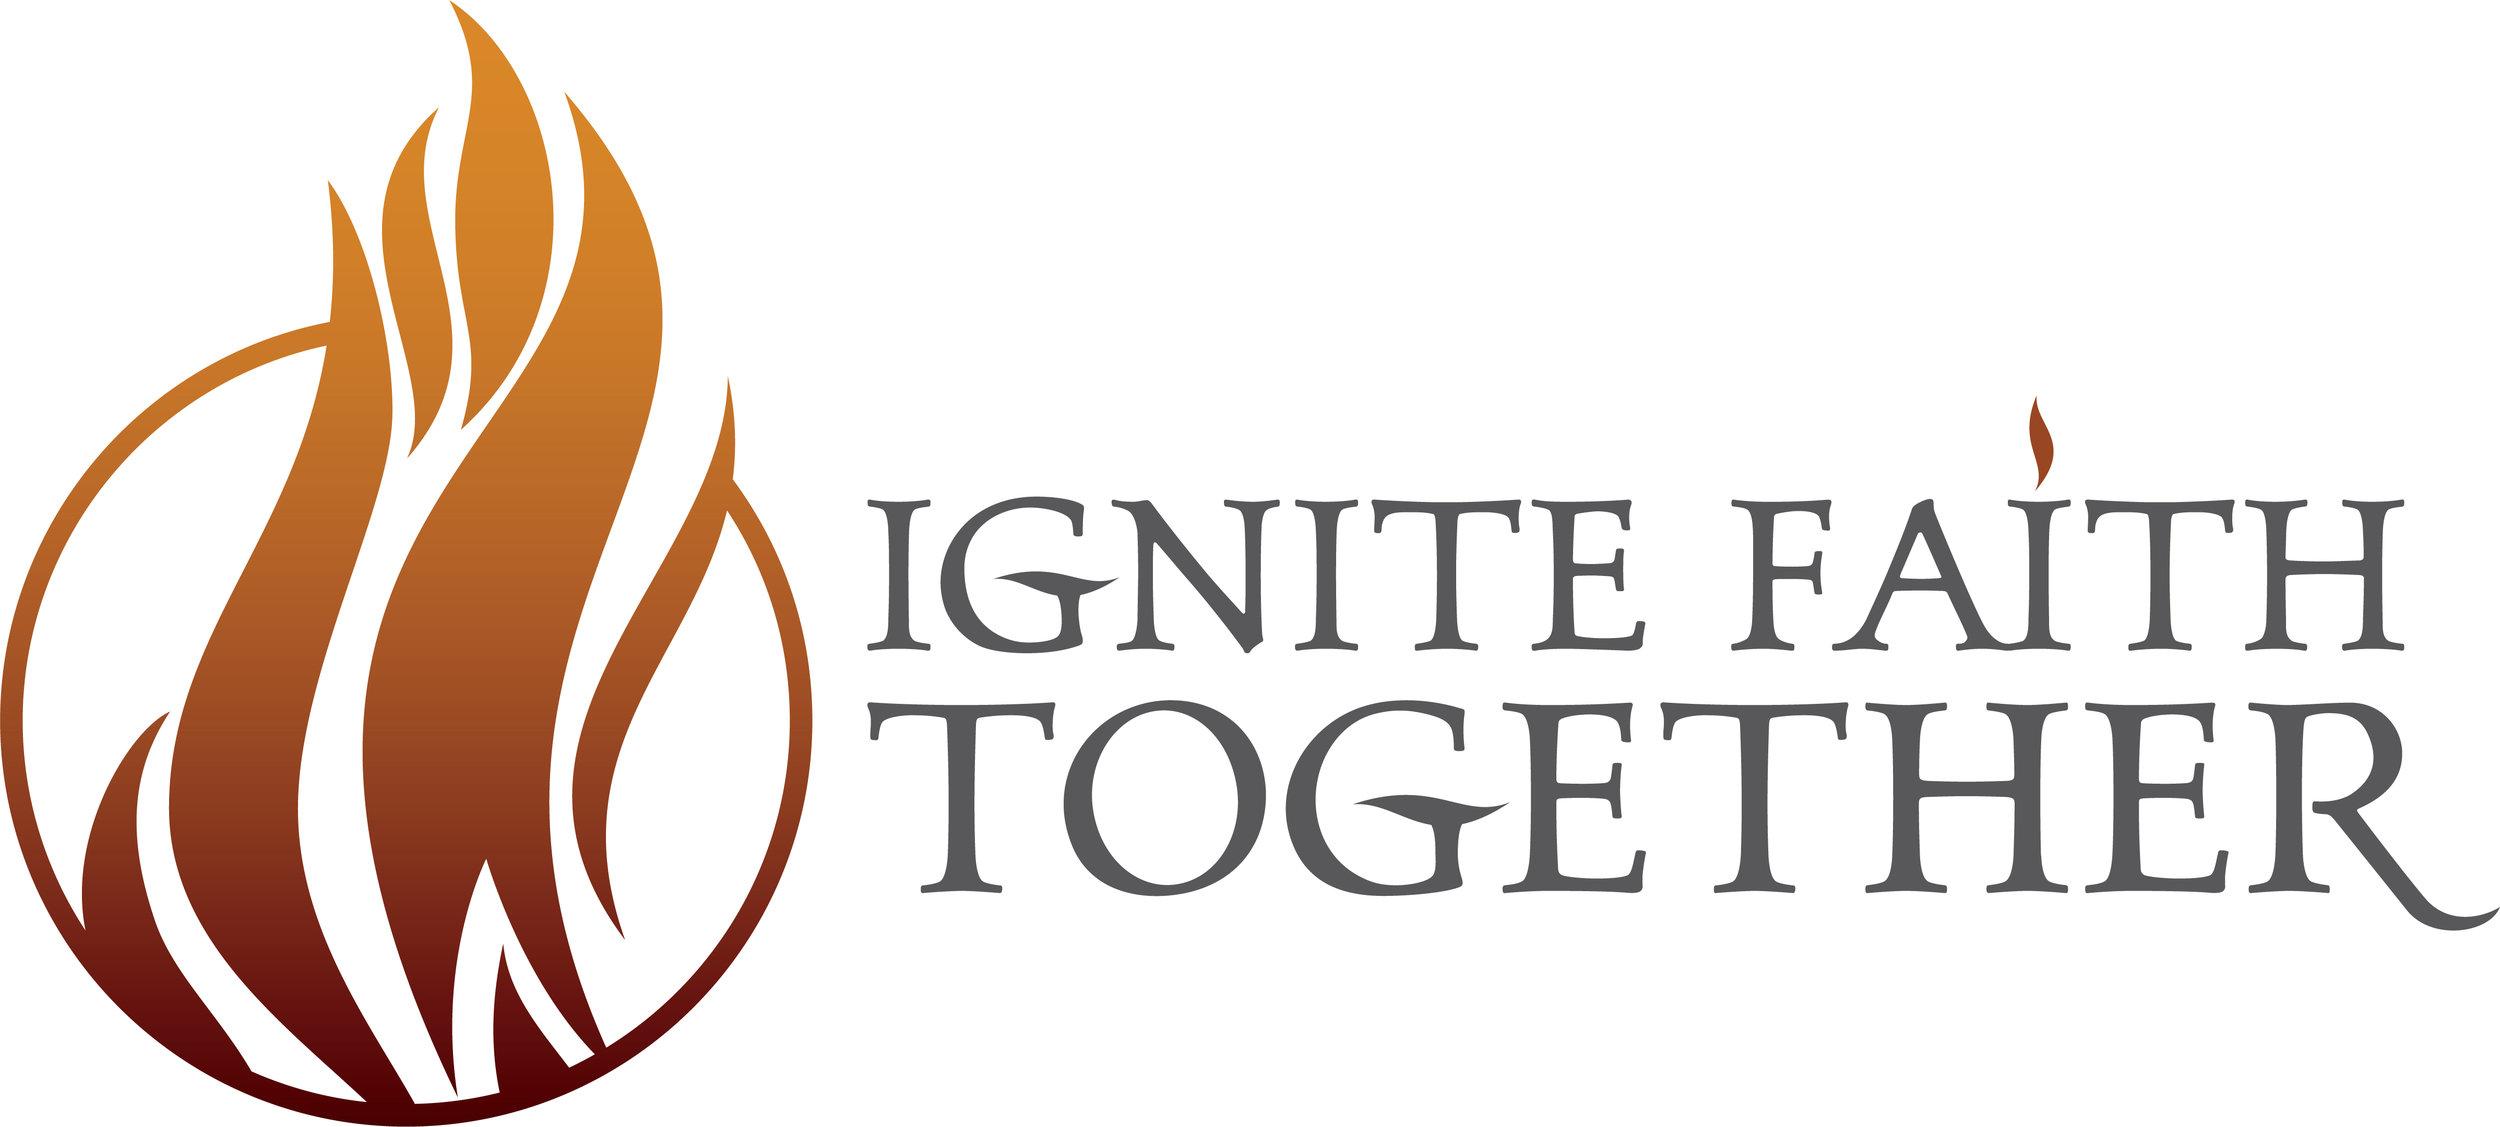 All Saints-Ignite Faith Together logo-color2.jpg